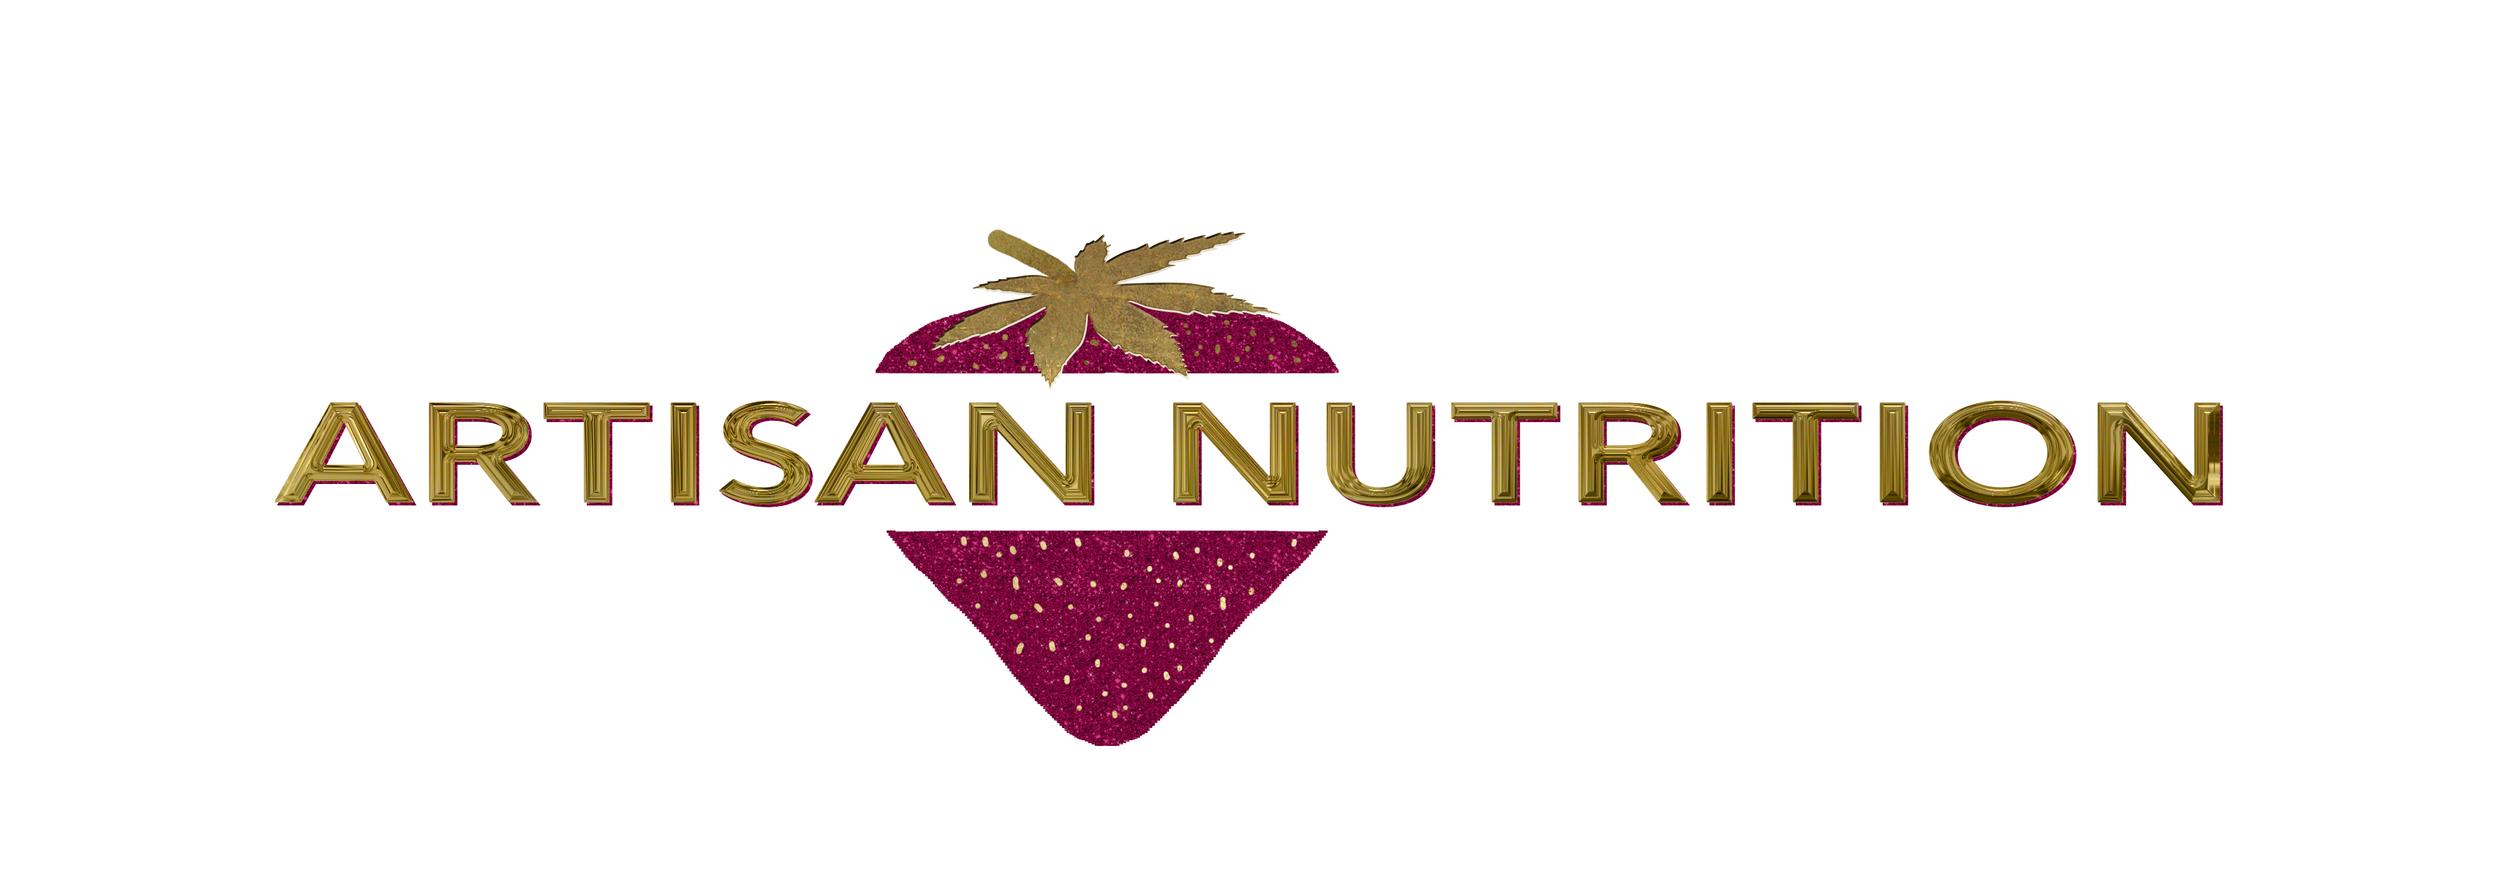 Artisan Nutrition Logo